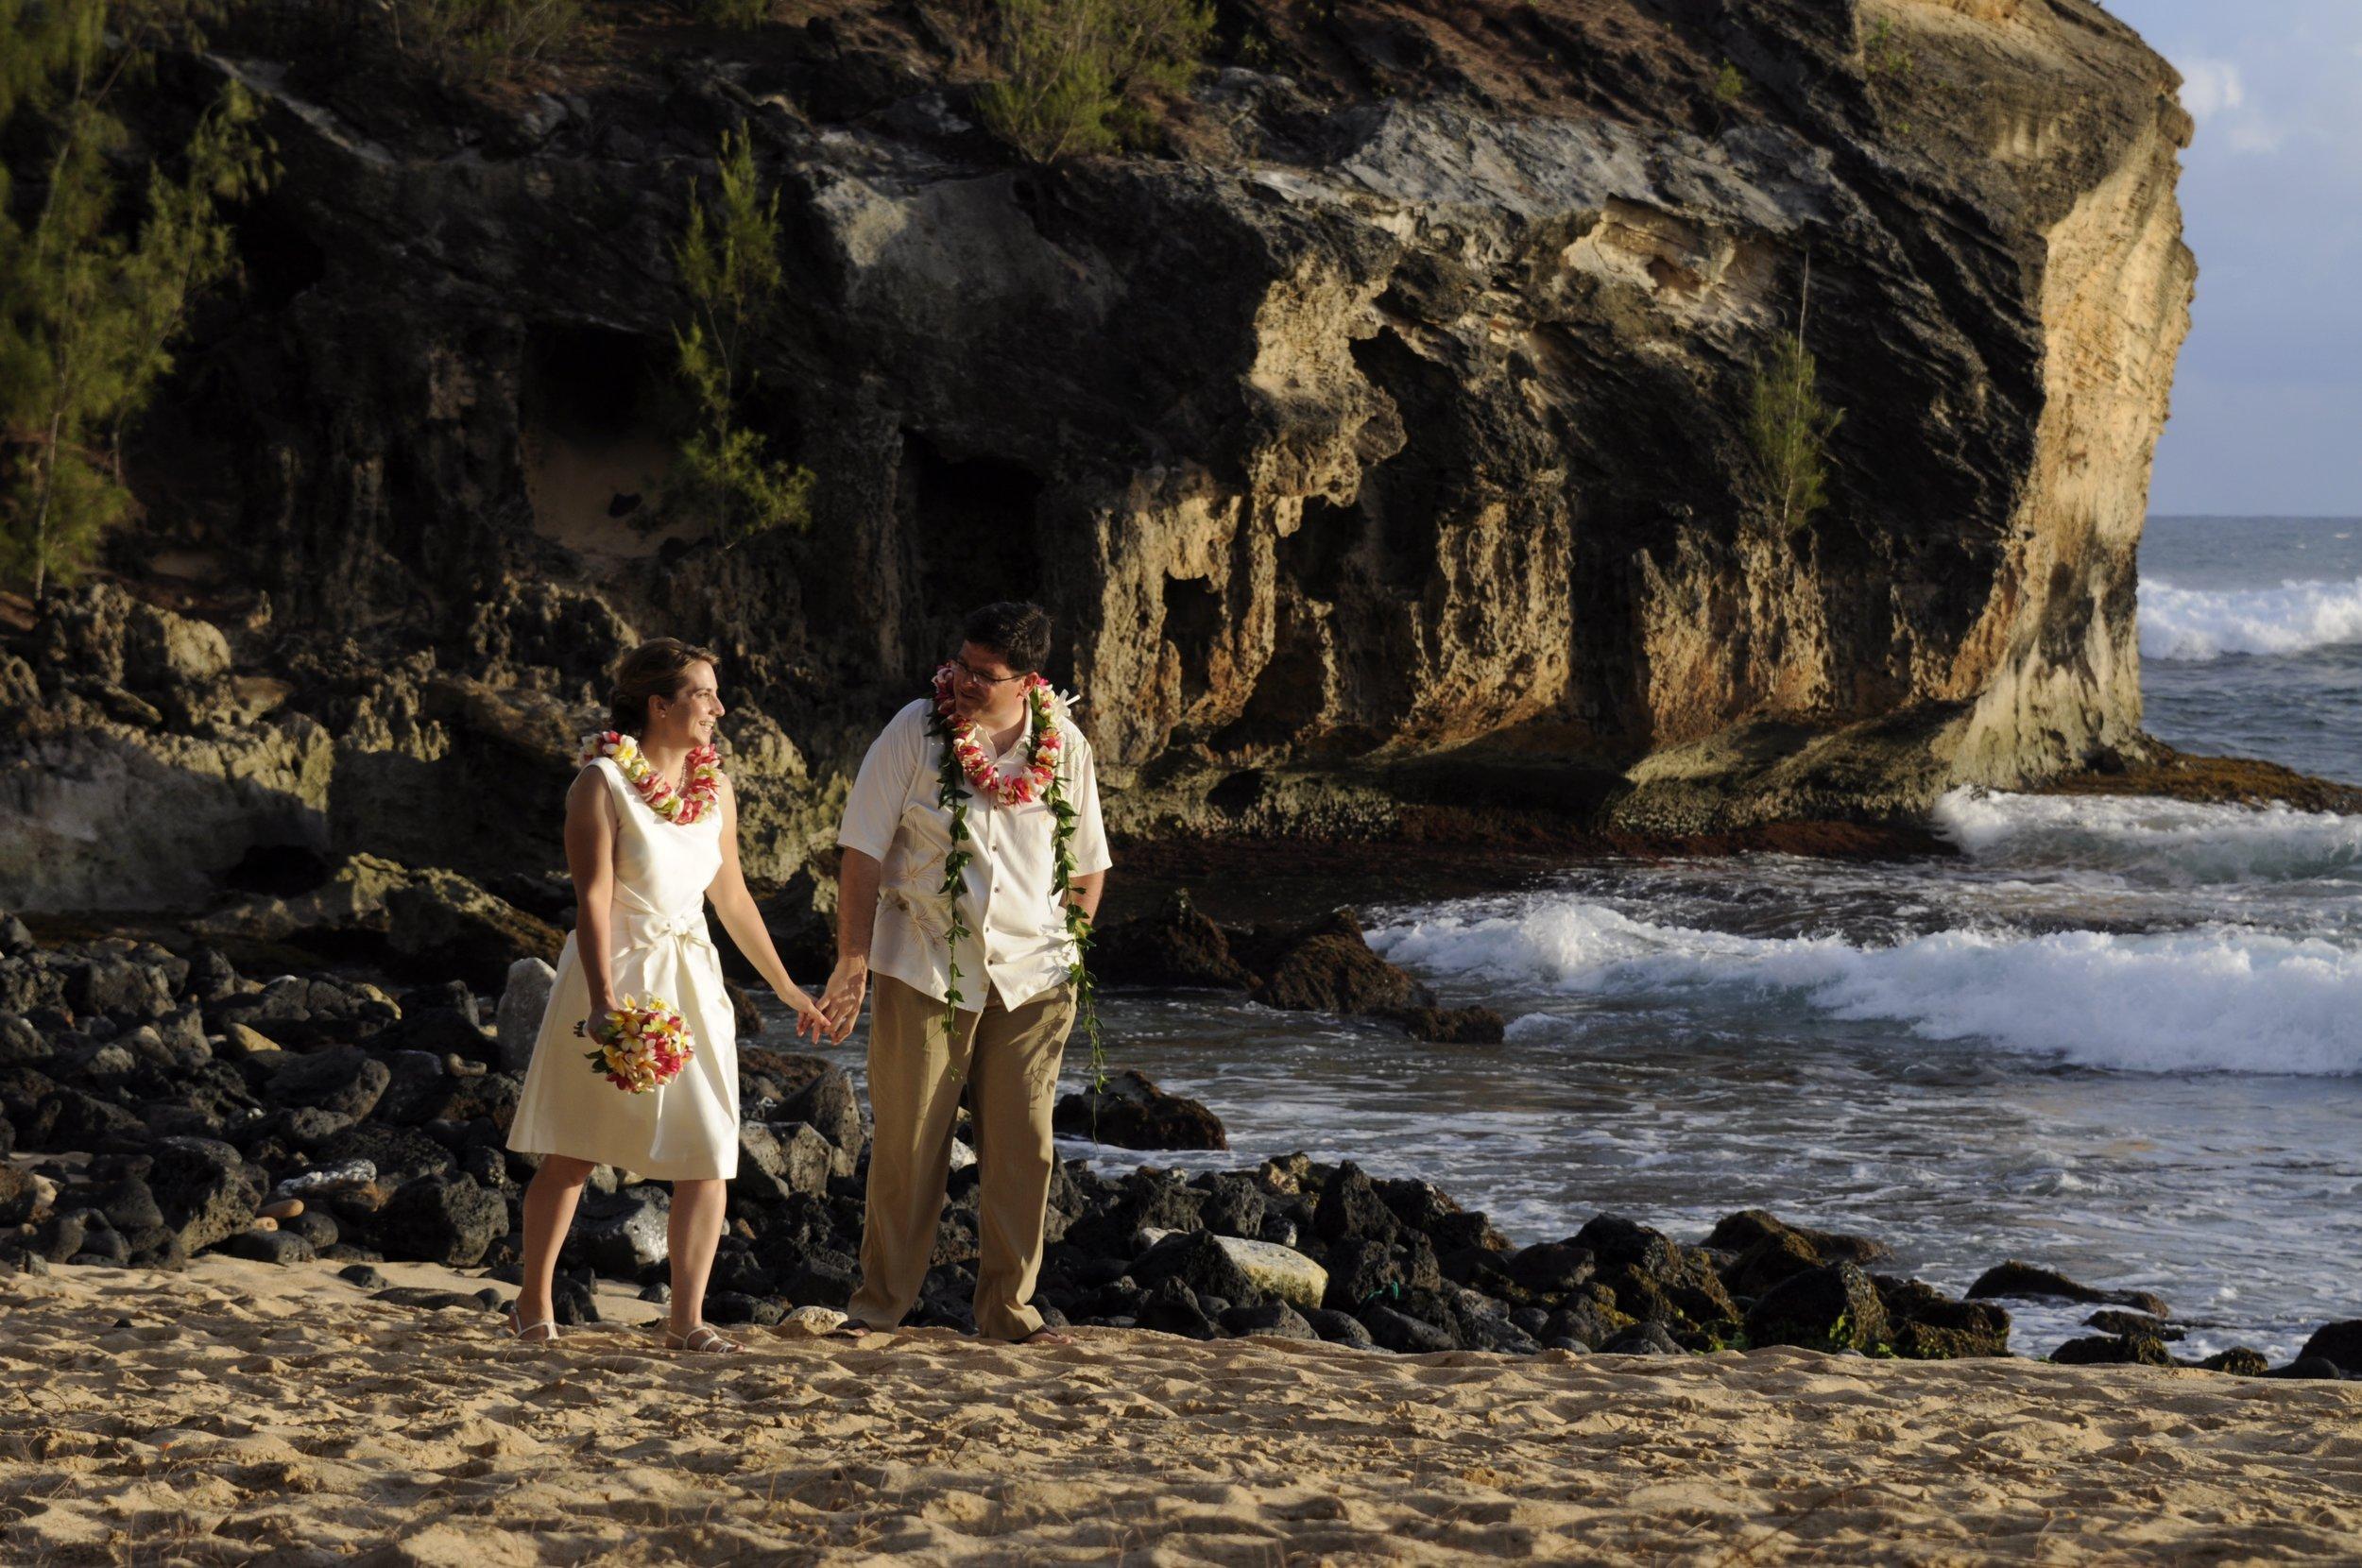 Amy and Keith, 2011. Vow renewal at Shipwreck Beach. Humm…